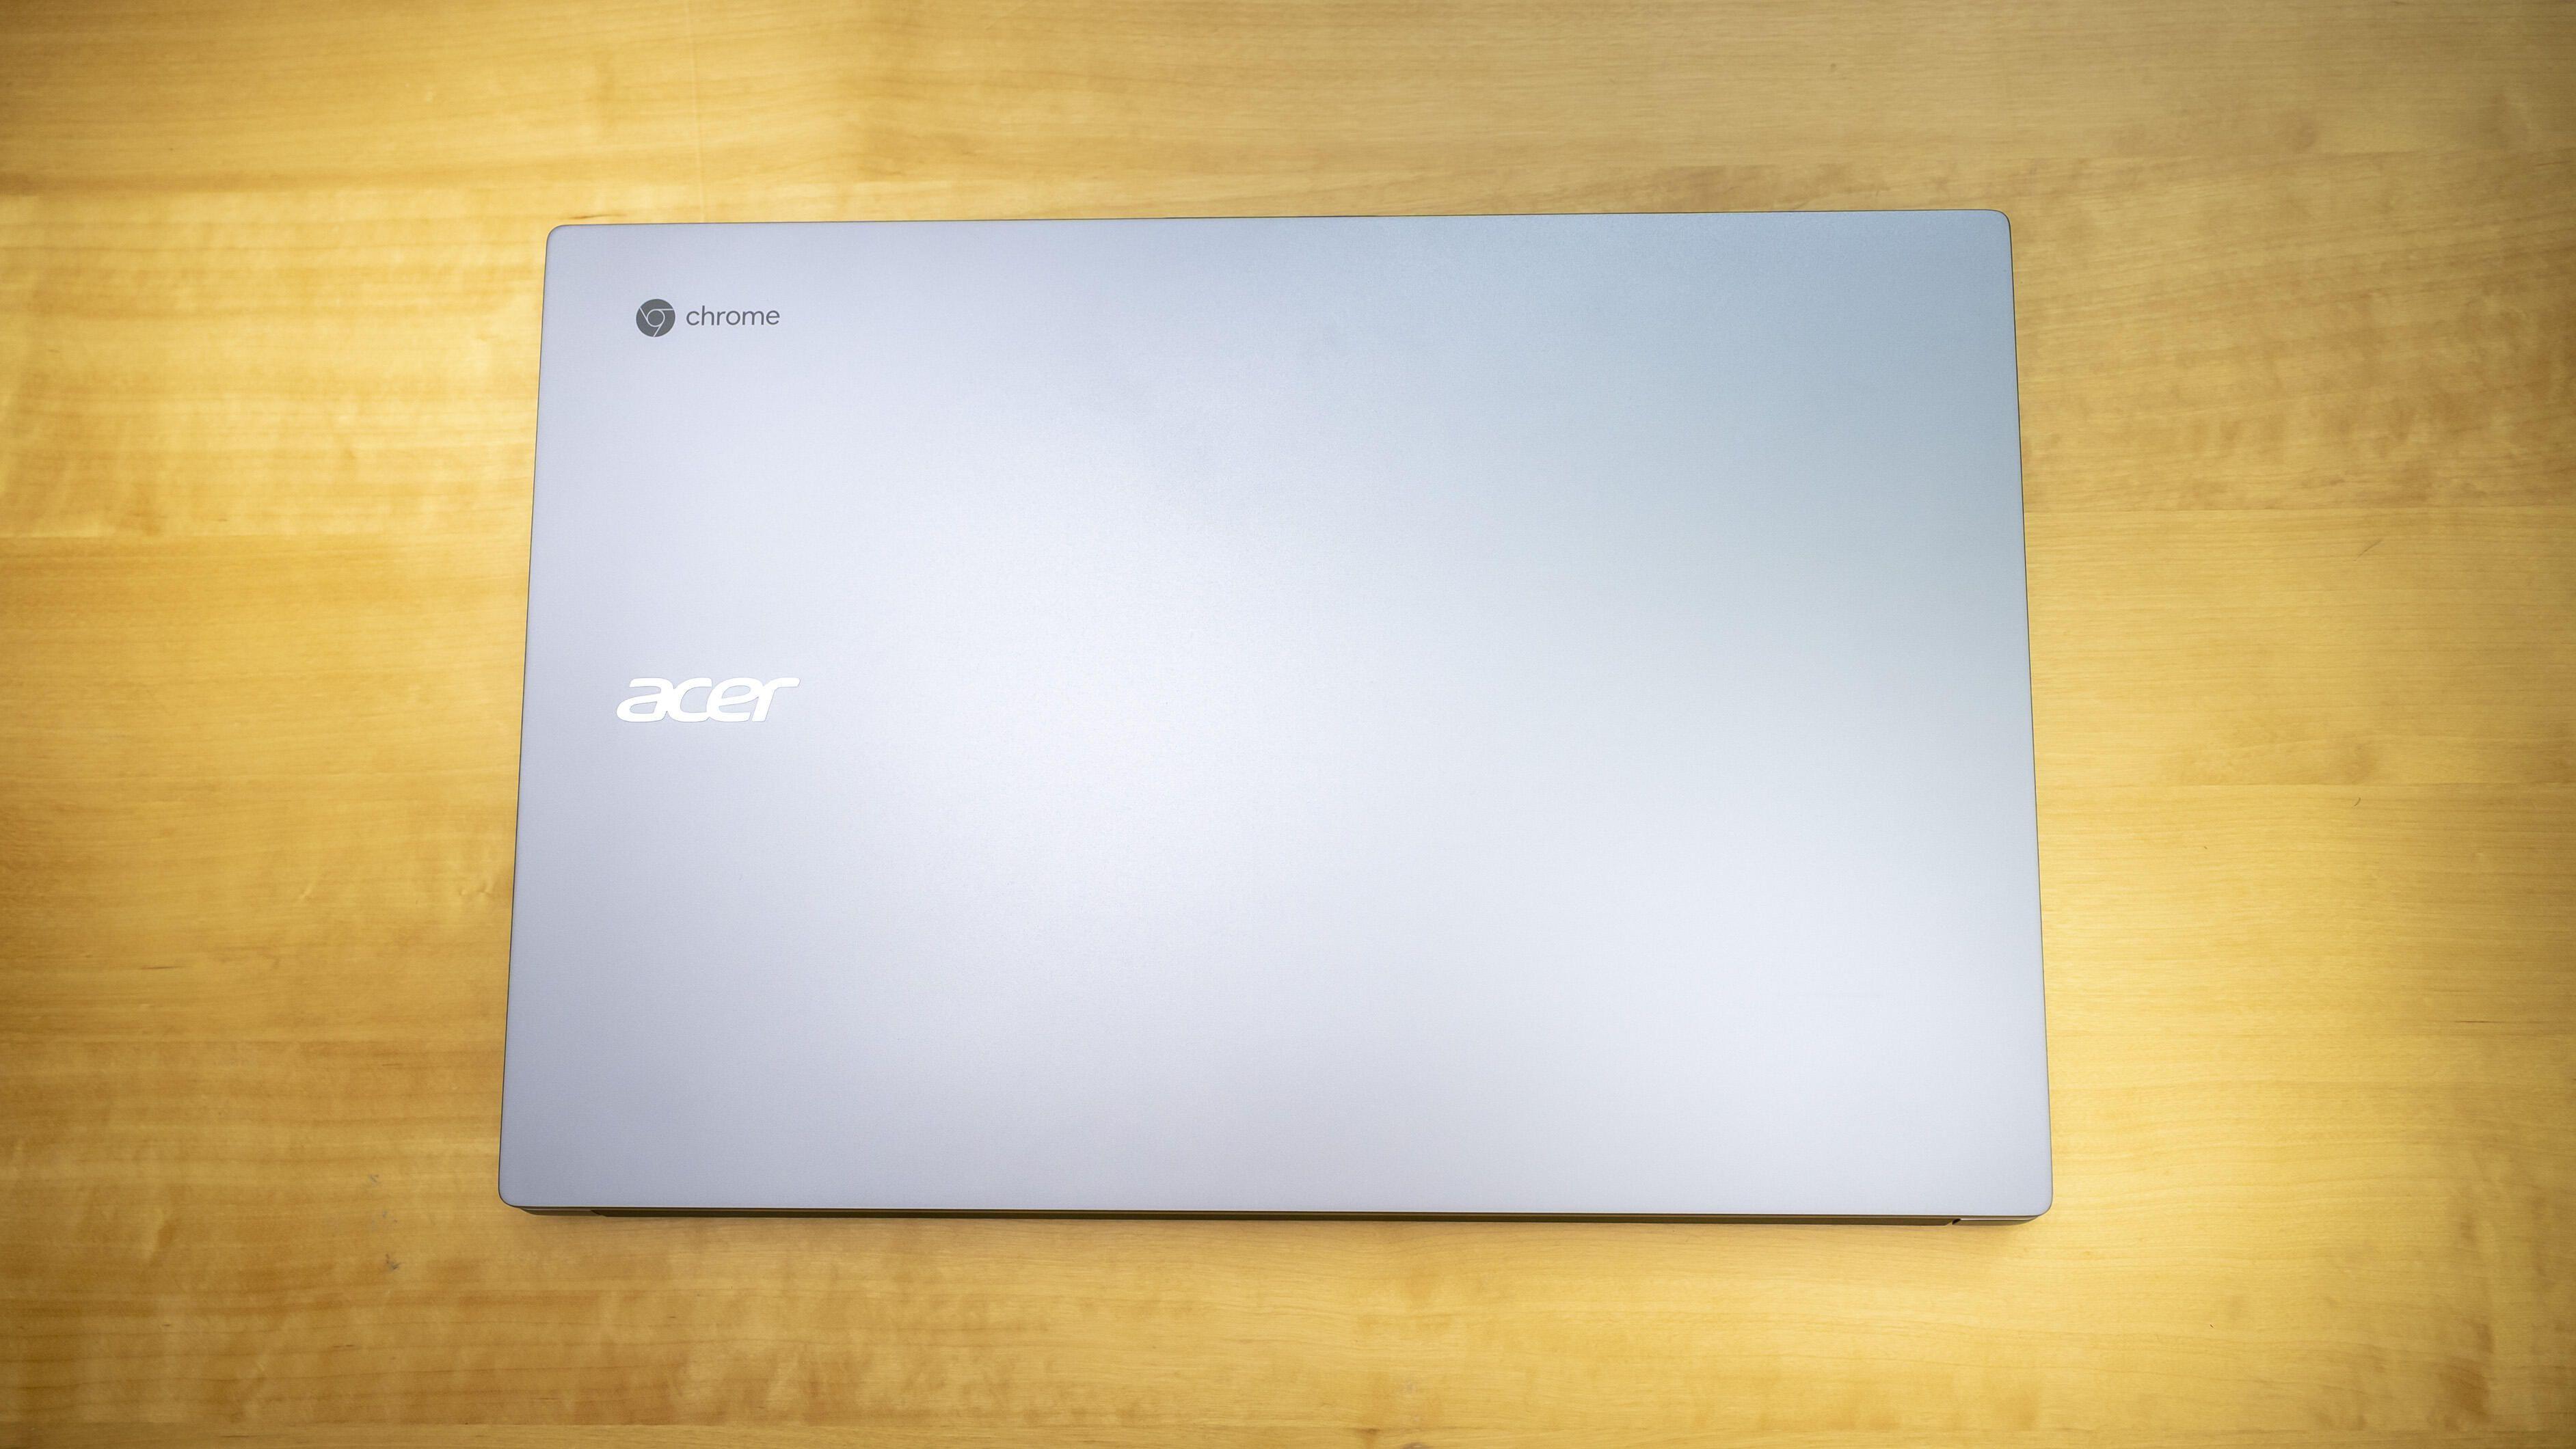 Acer-chromebook-715-01-5